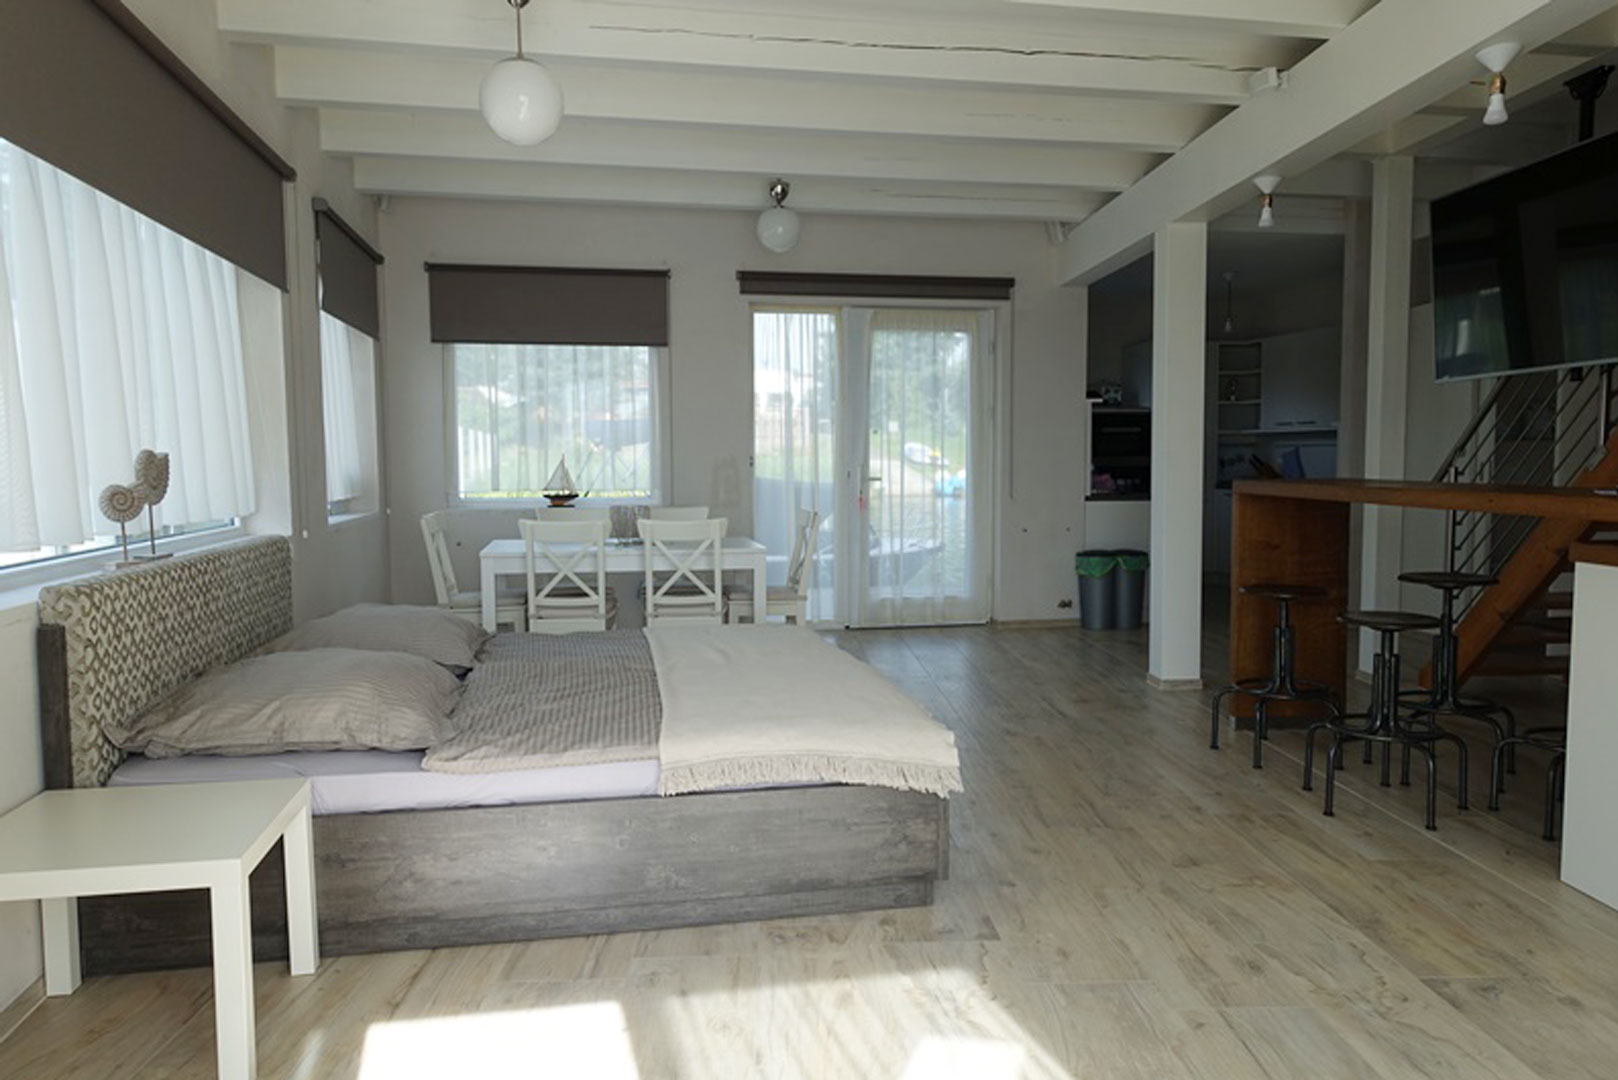 saal fur hochzeit mieten. Black Bedroom Furniture Sets. Home Design Ideas